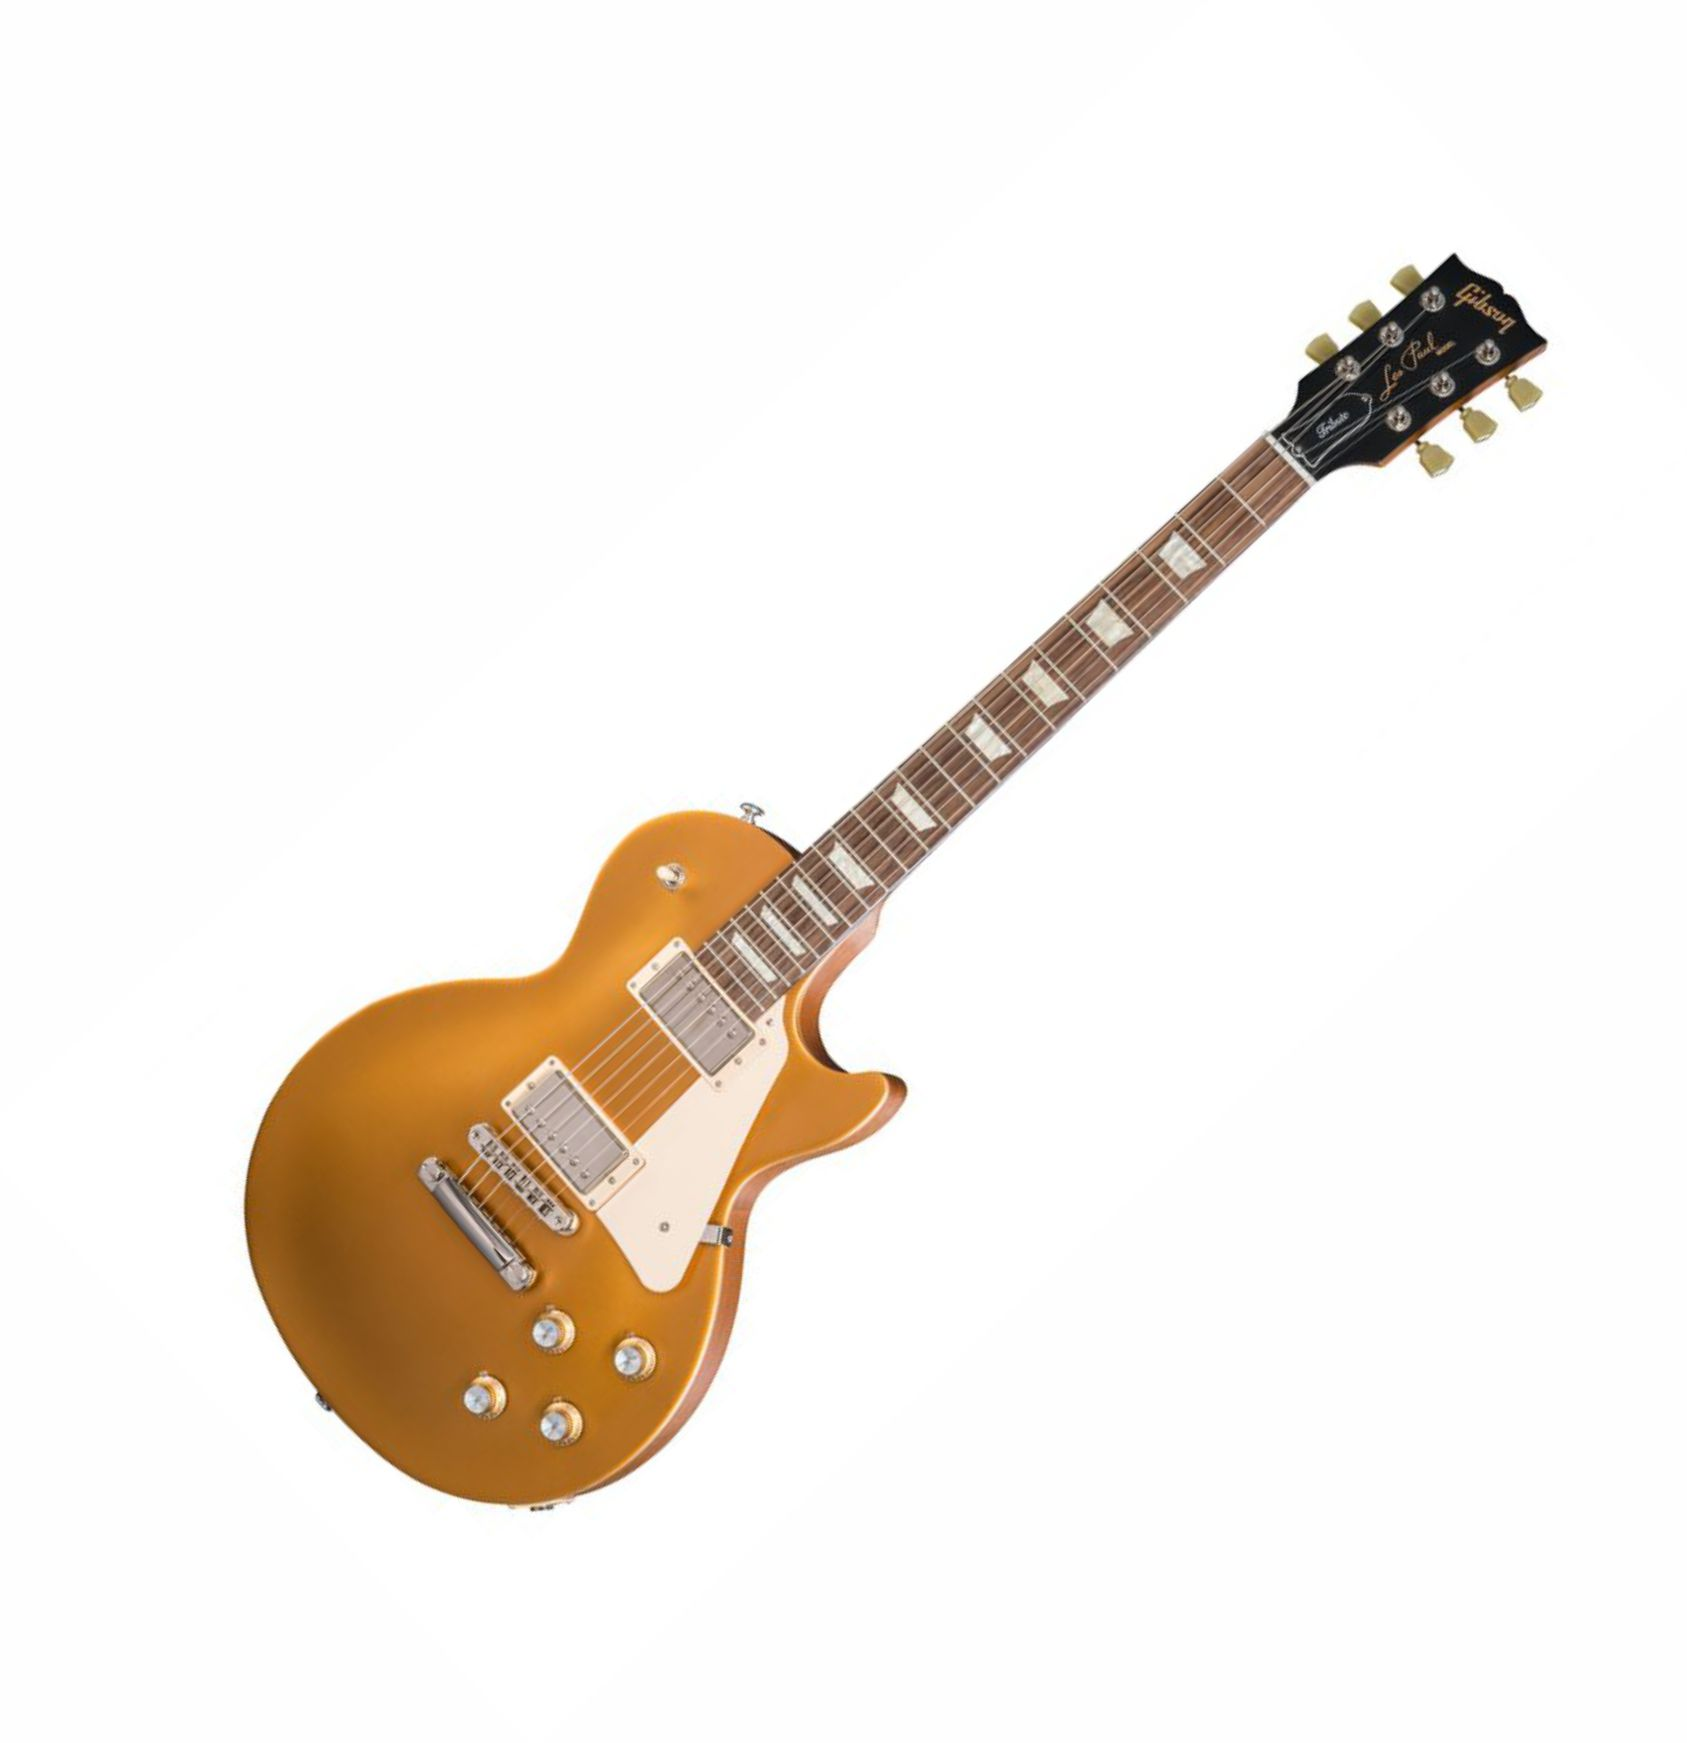 Guitarra Gibson Les Paul Tribute 2018 | Case | Satin Gold Top